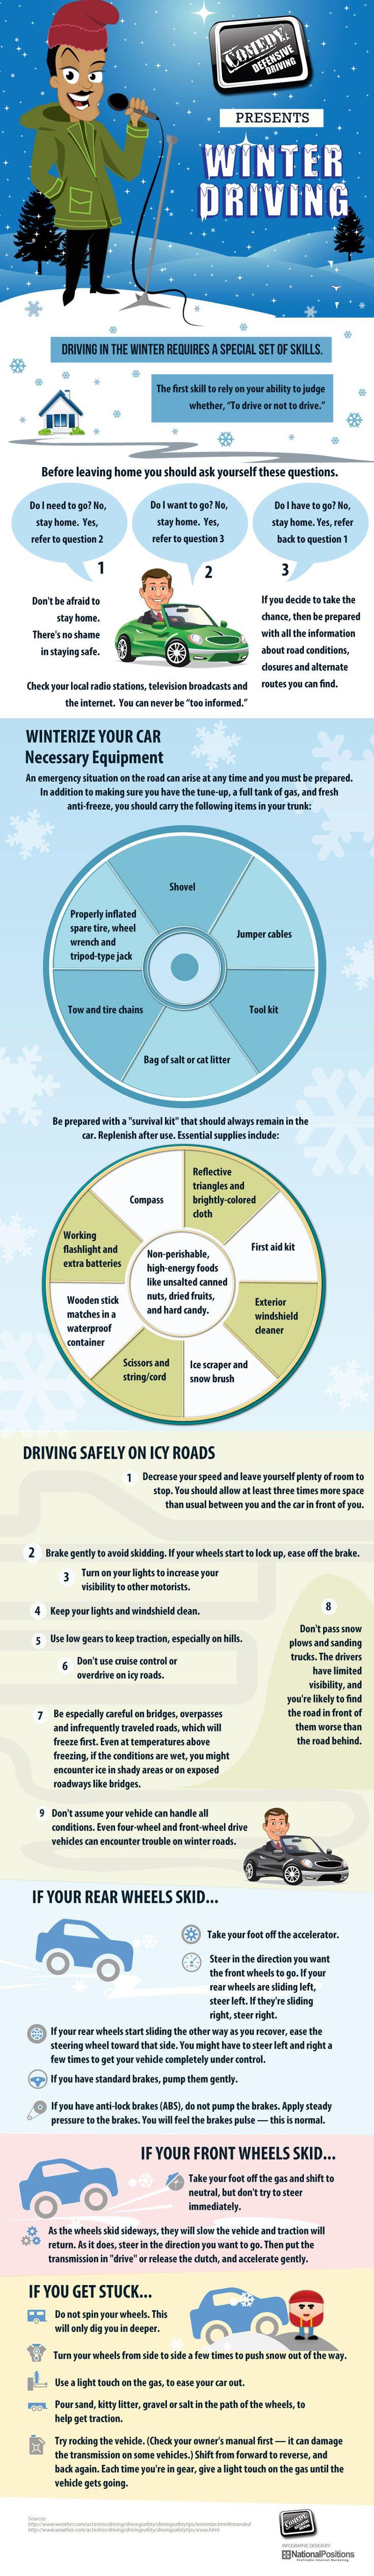 A guide to winter driving winter driving winter driving